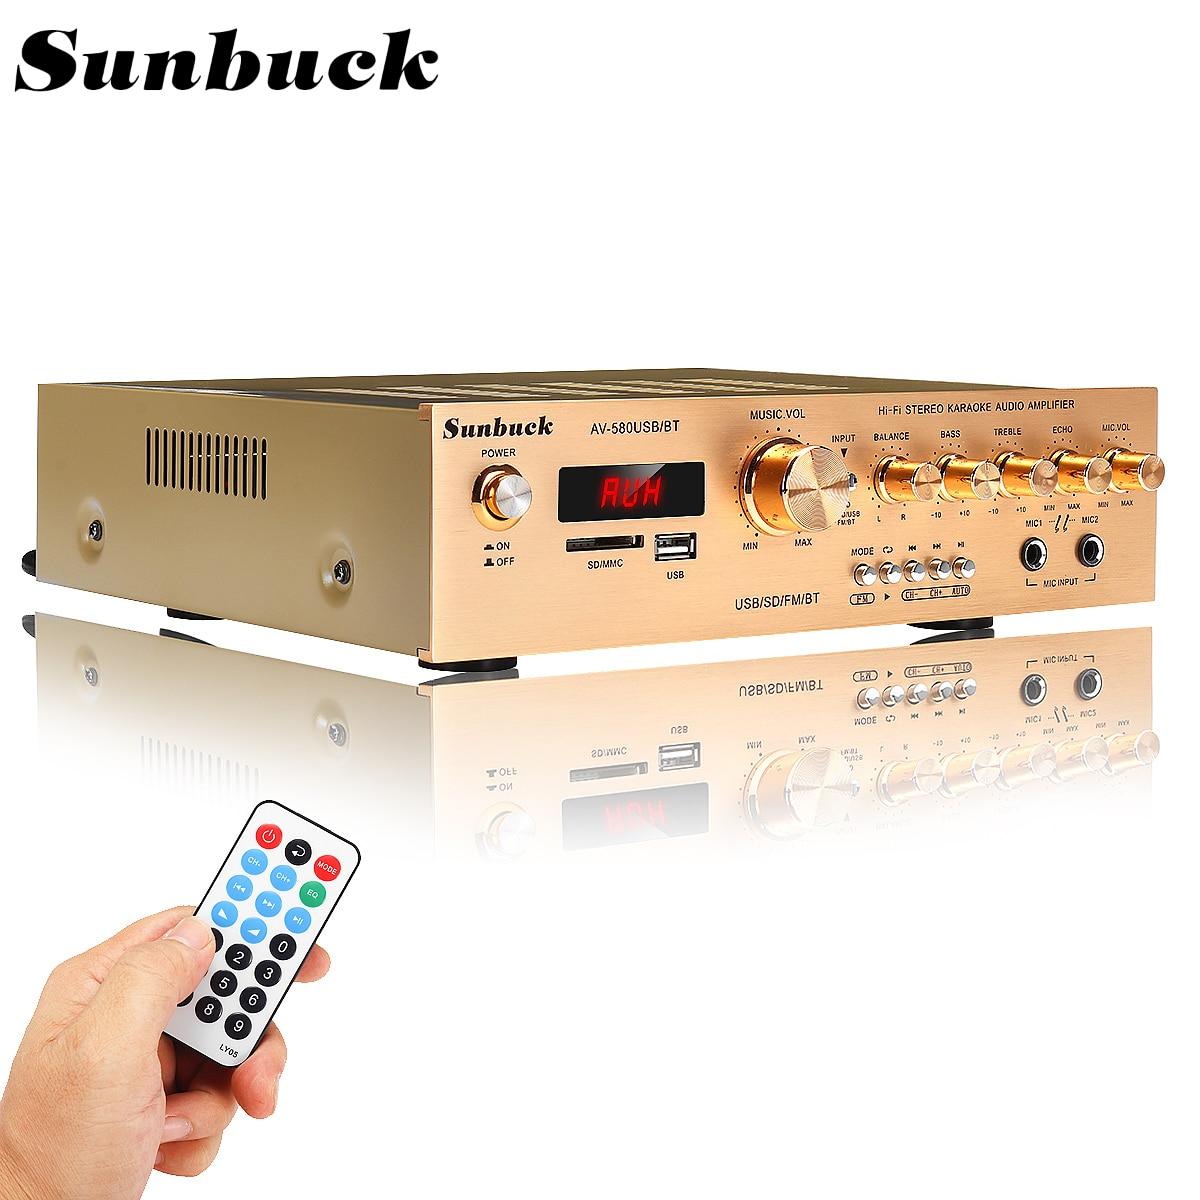 Sunbuck 5 canais bluetooth5.0 fm amplificador estéreo de alta fidelidade led digital karaoke cinema em casa amplificadores de cinema em casa